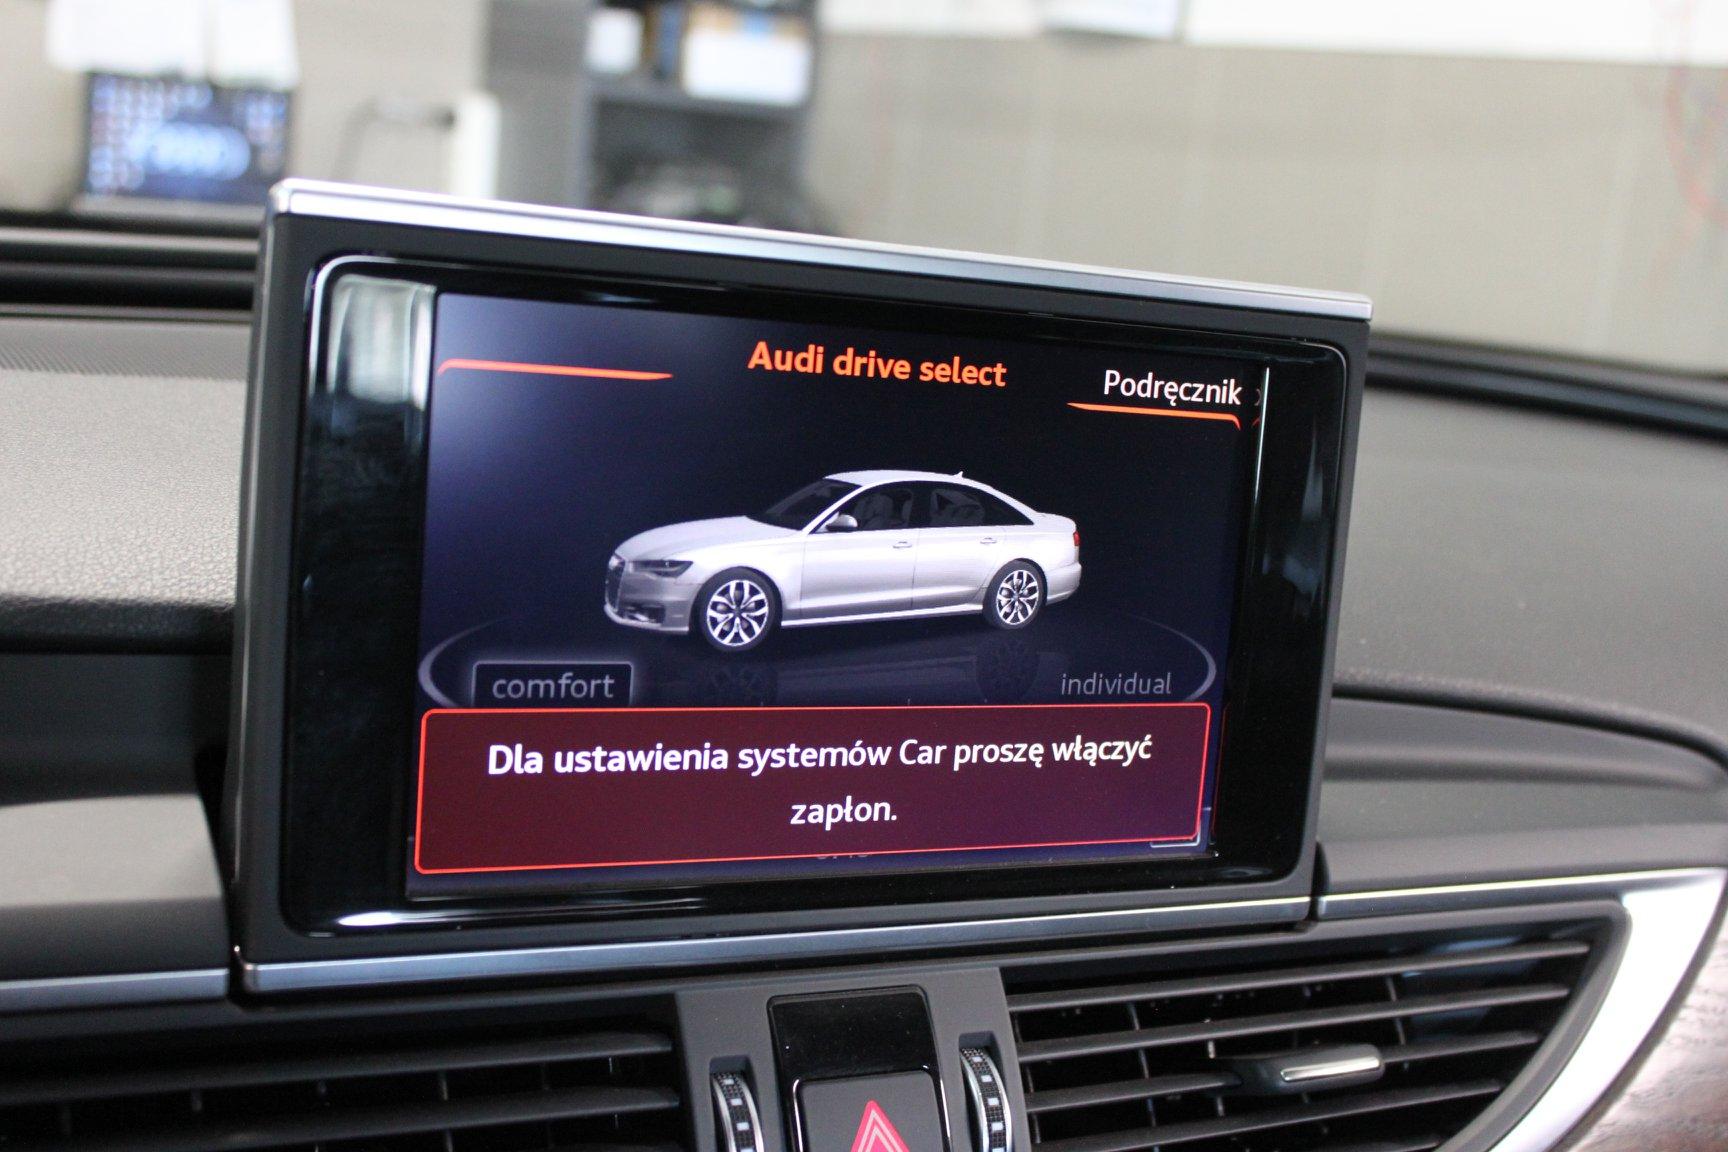 AUDI A6 C7 FL 2.0 TFSI 2017